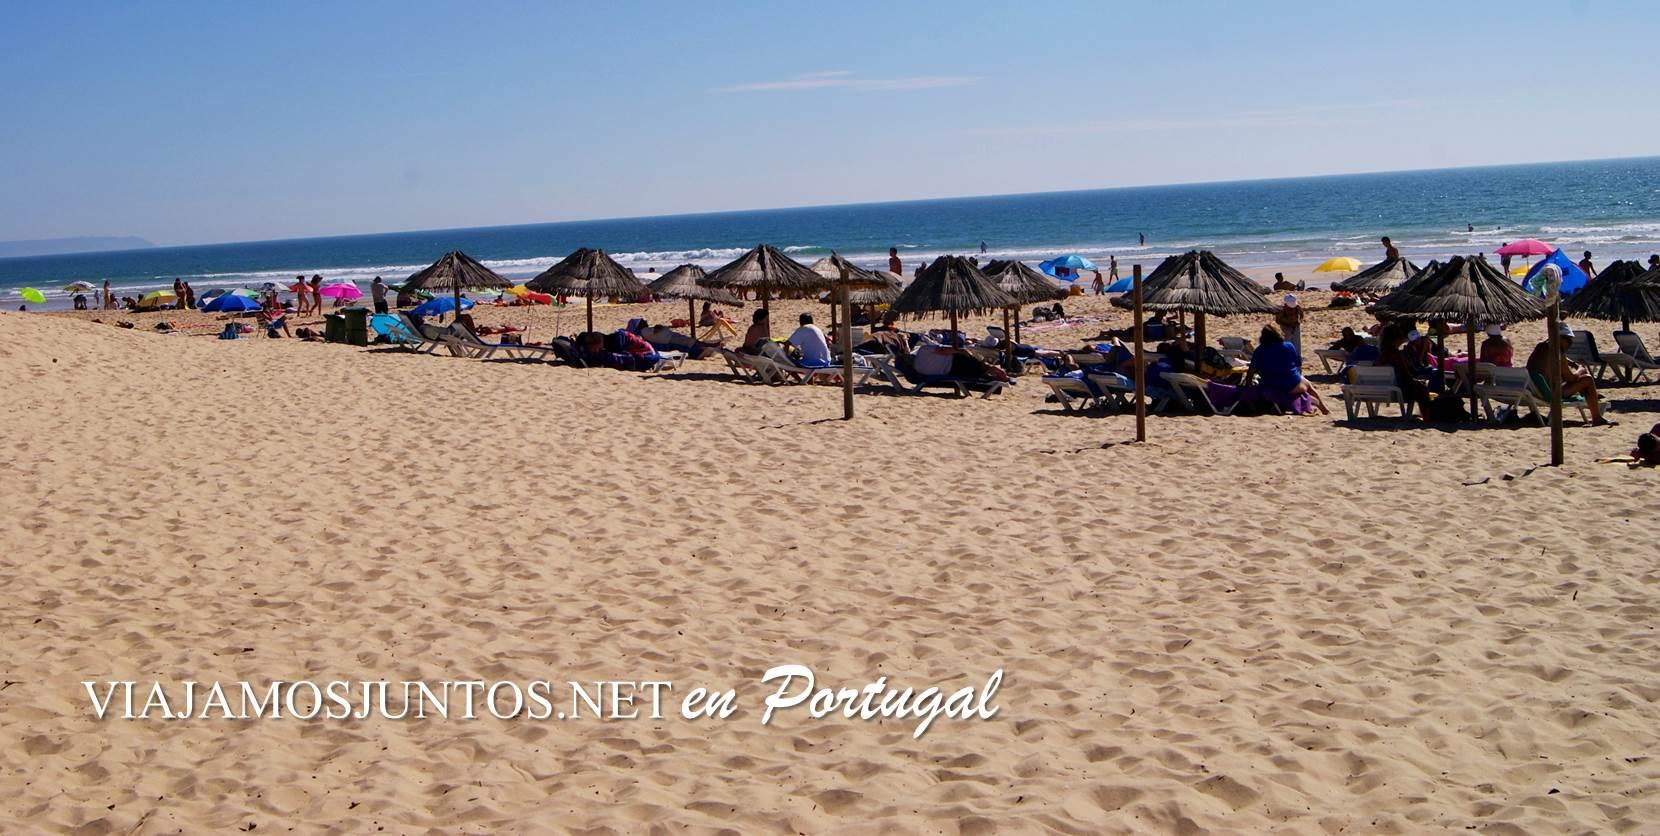 Playa de Castillo, Costa Caparica, Portugal